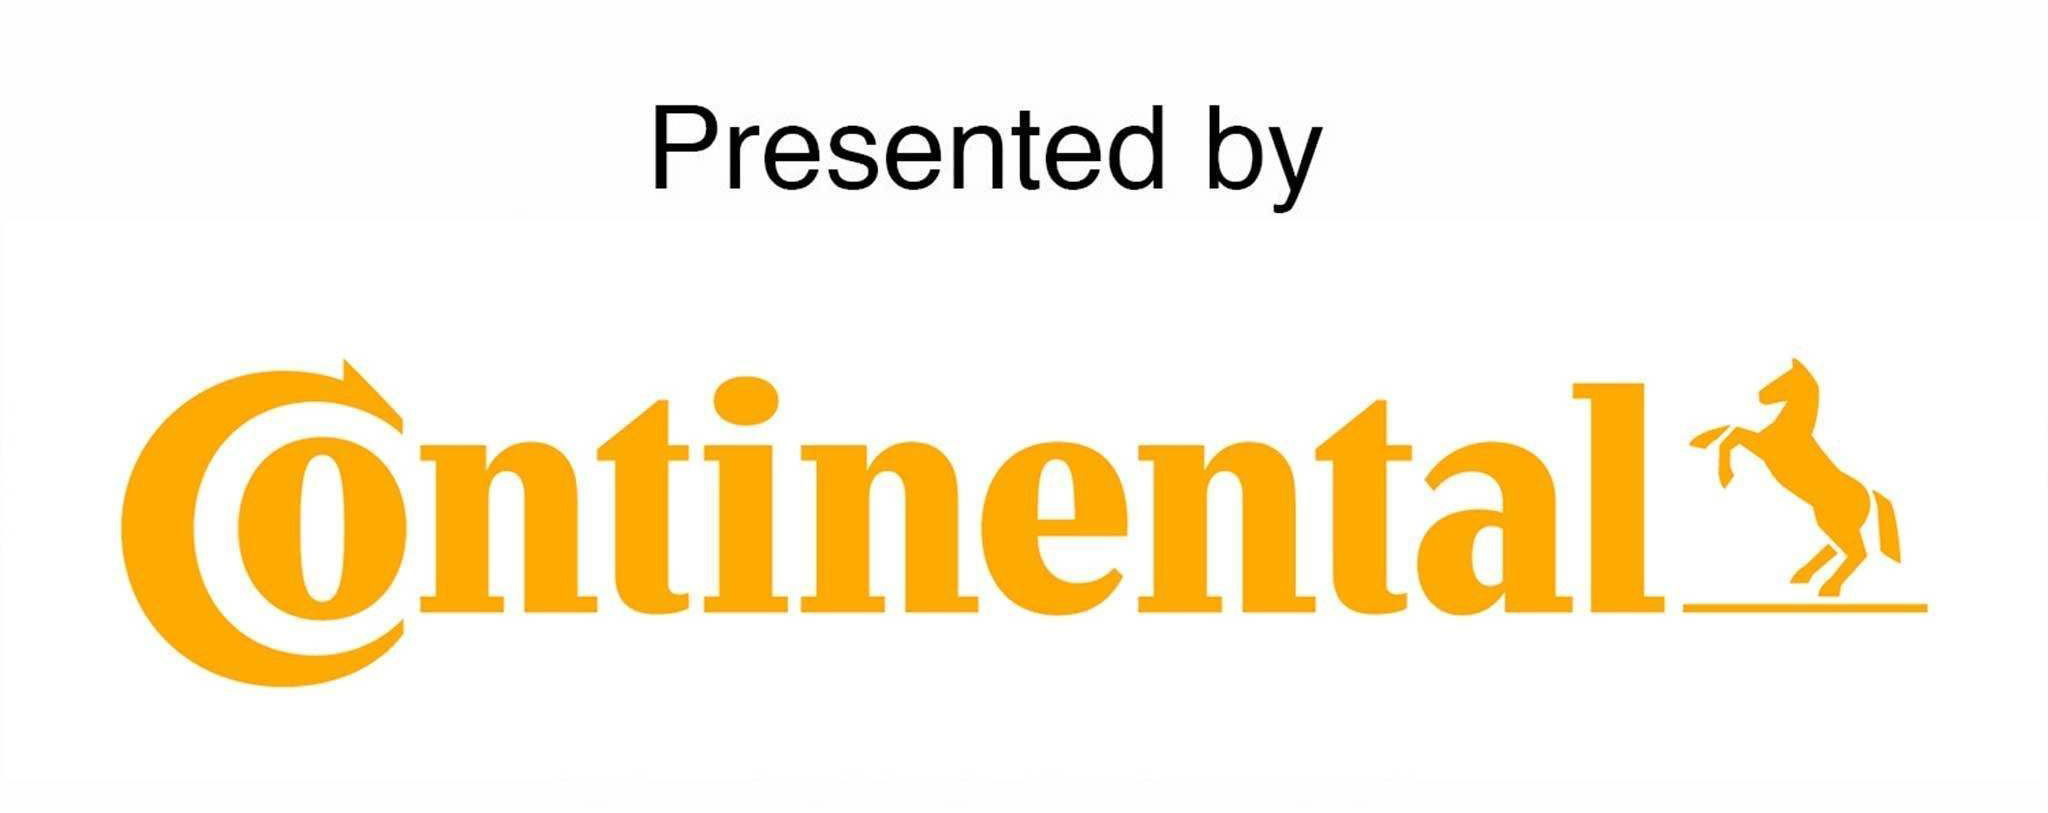 اسرار نهفته لوگوی Continental